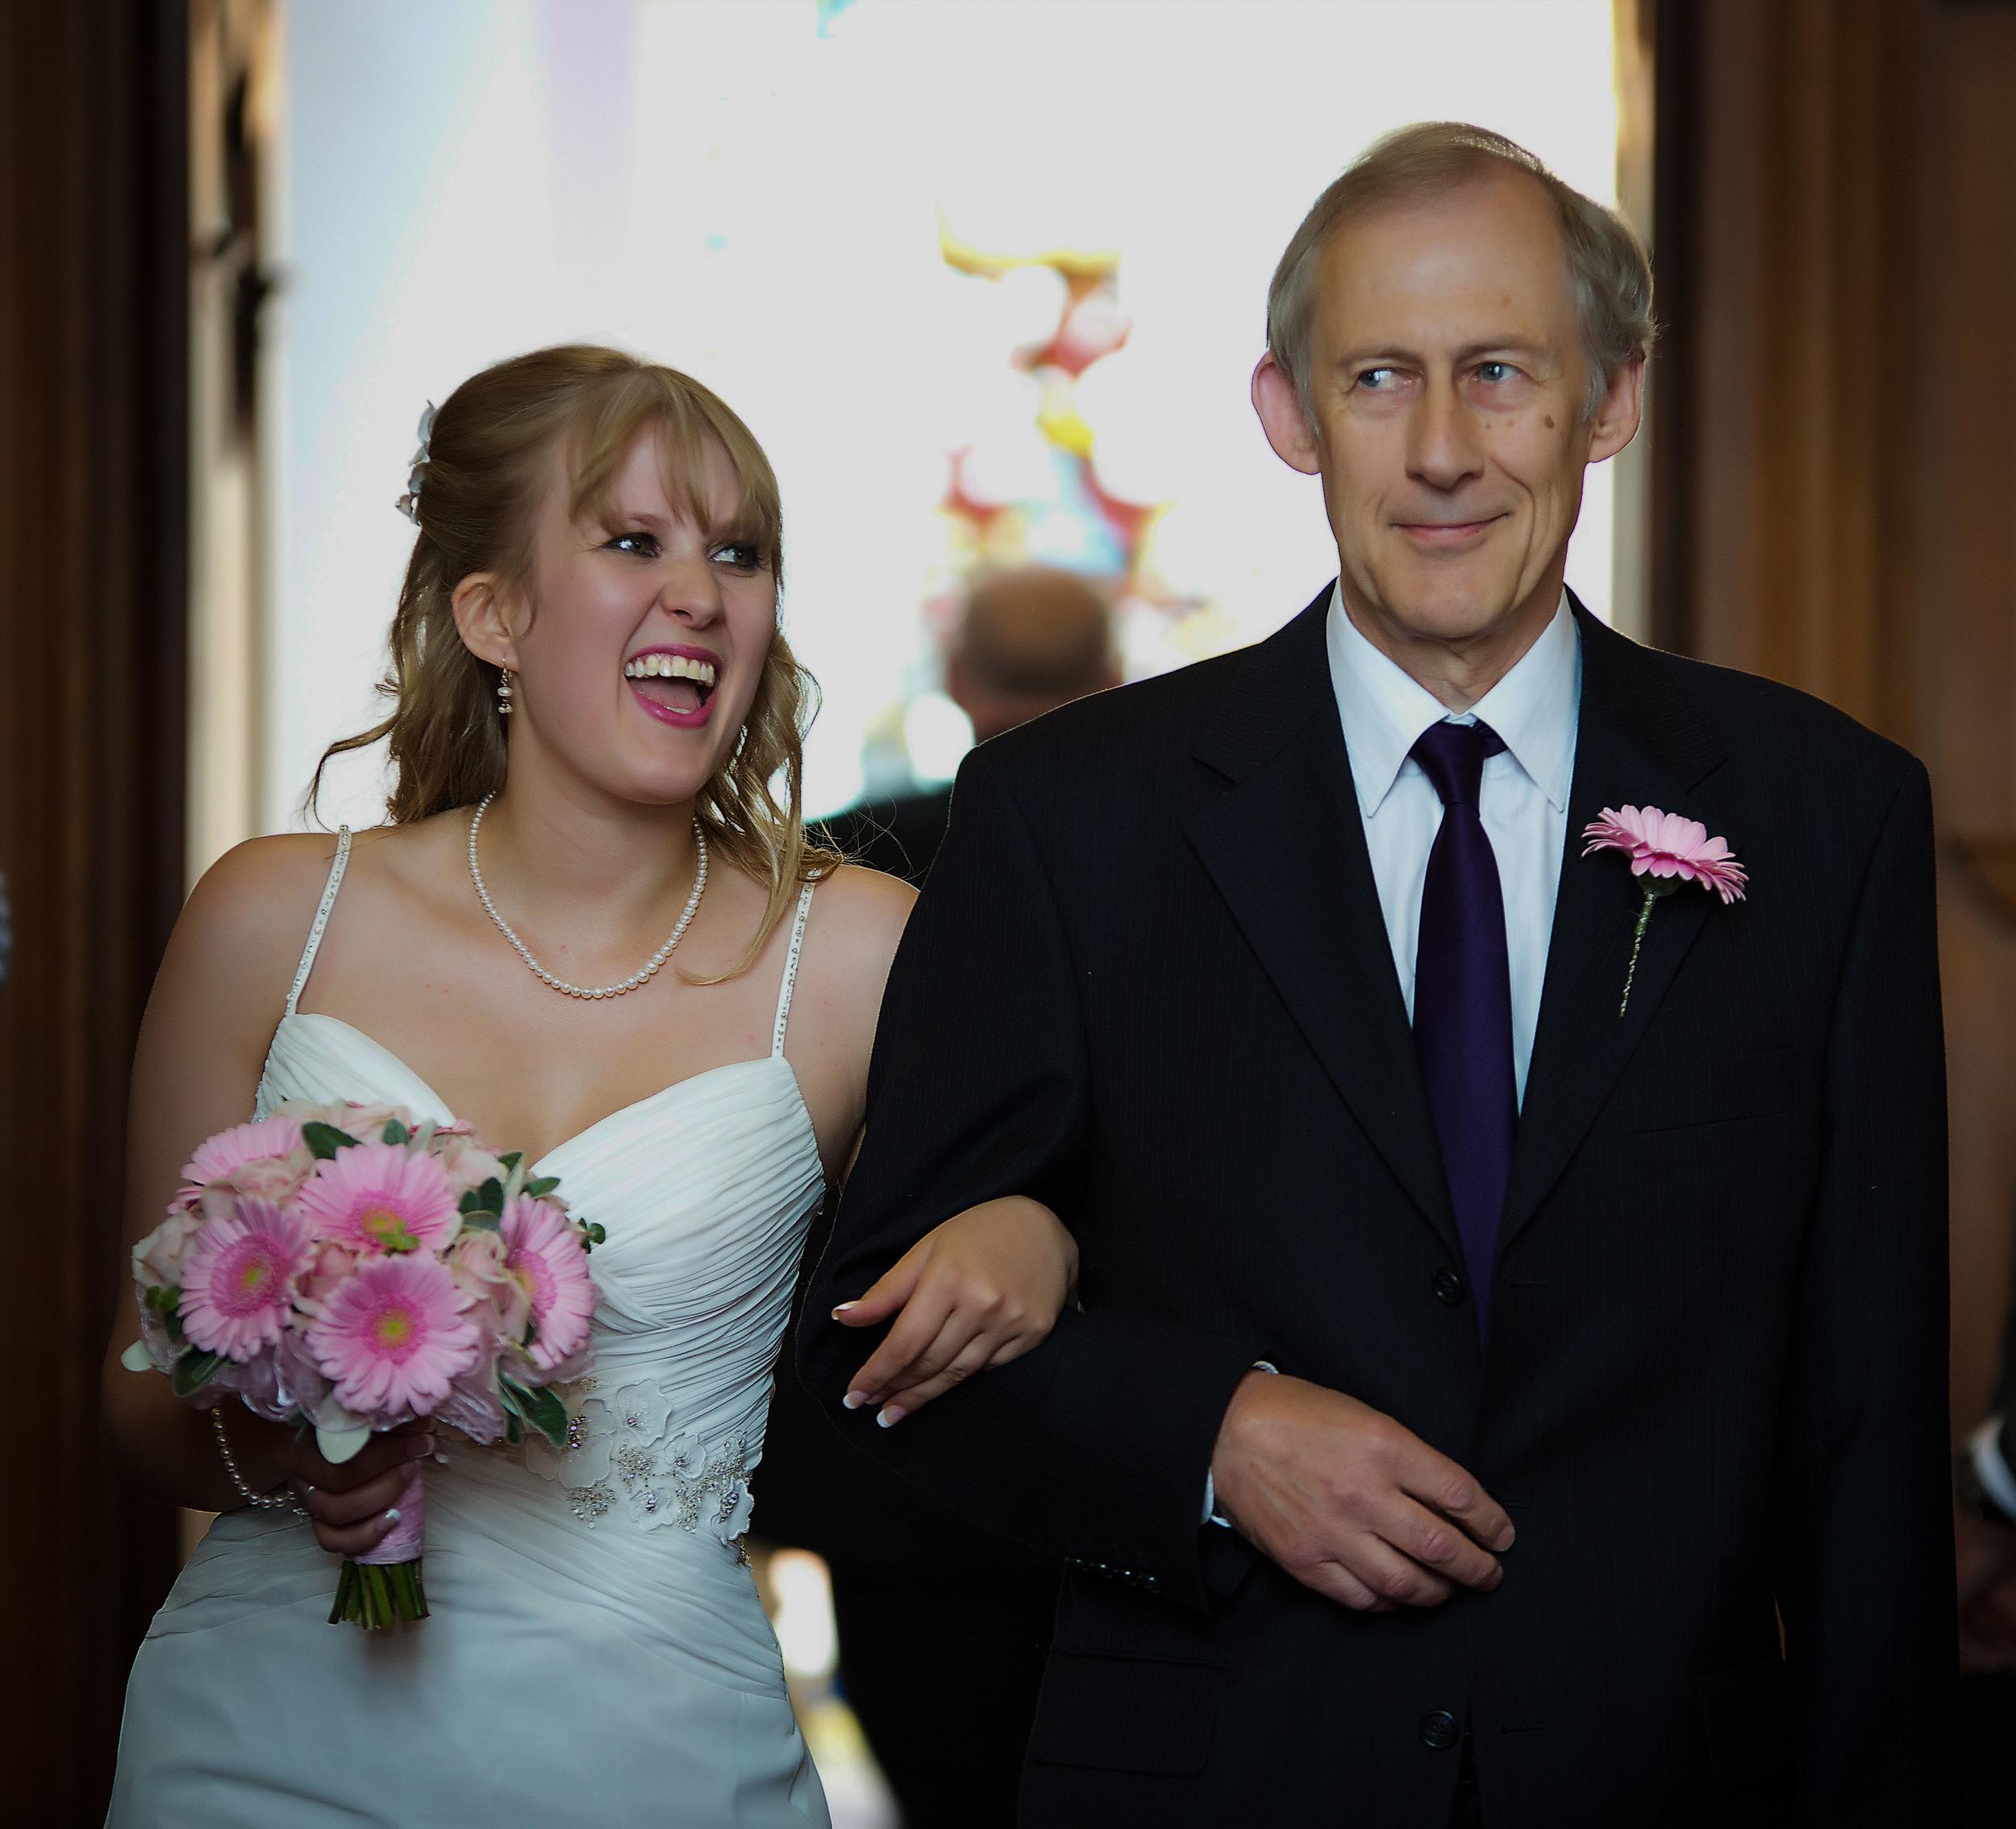 essex-bride-aisle-father-london-uk-destination-wedding-photography-Adam-Rowley